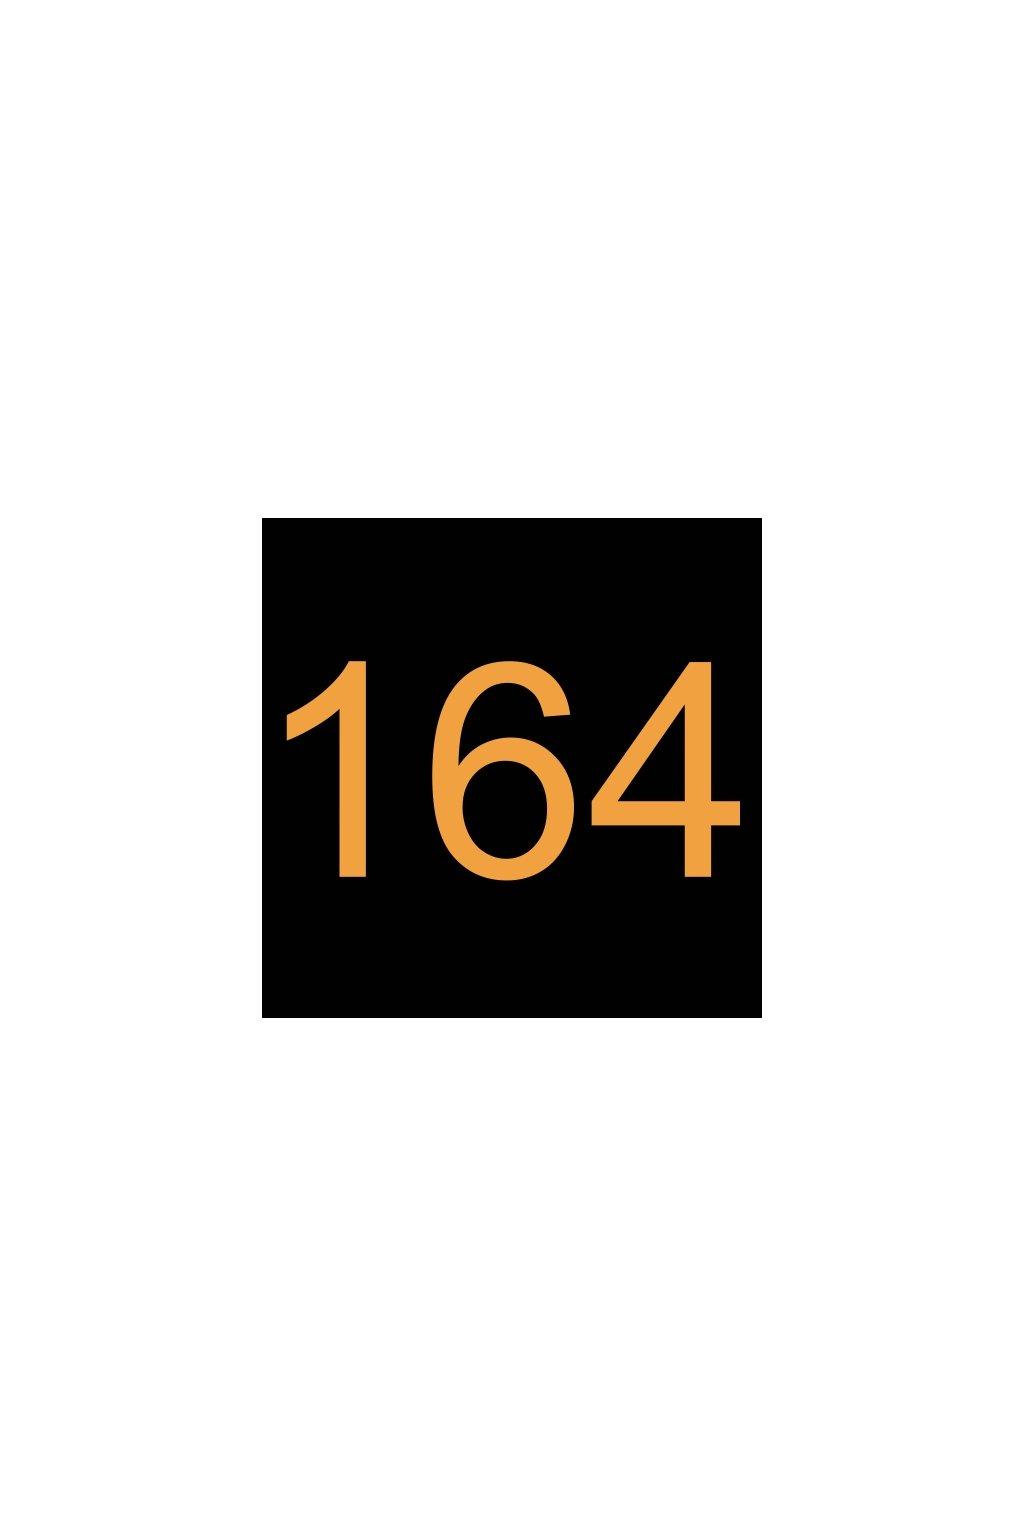 N630003 PRUŽINA 164